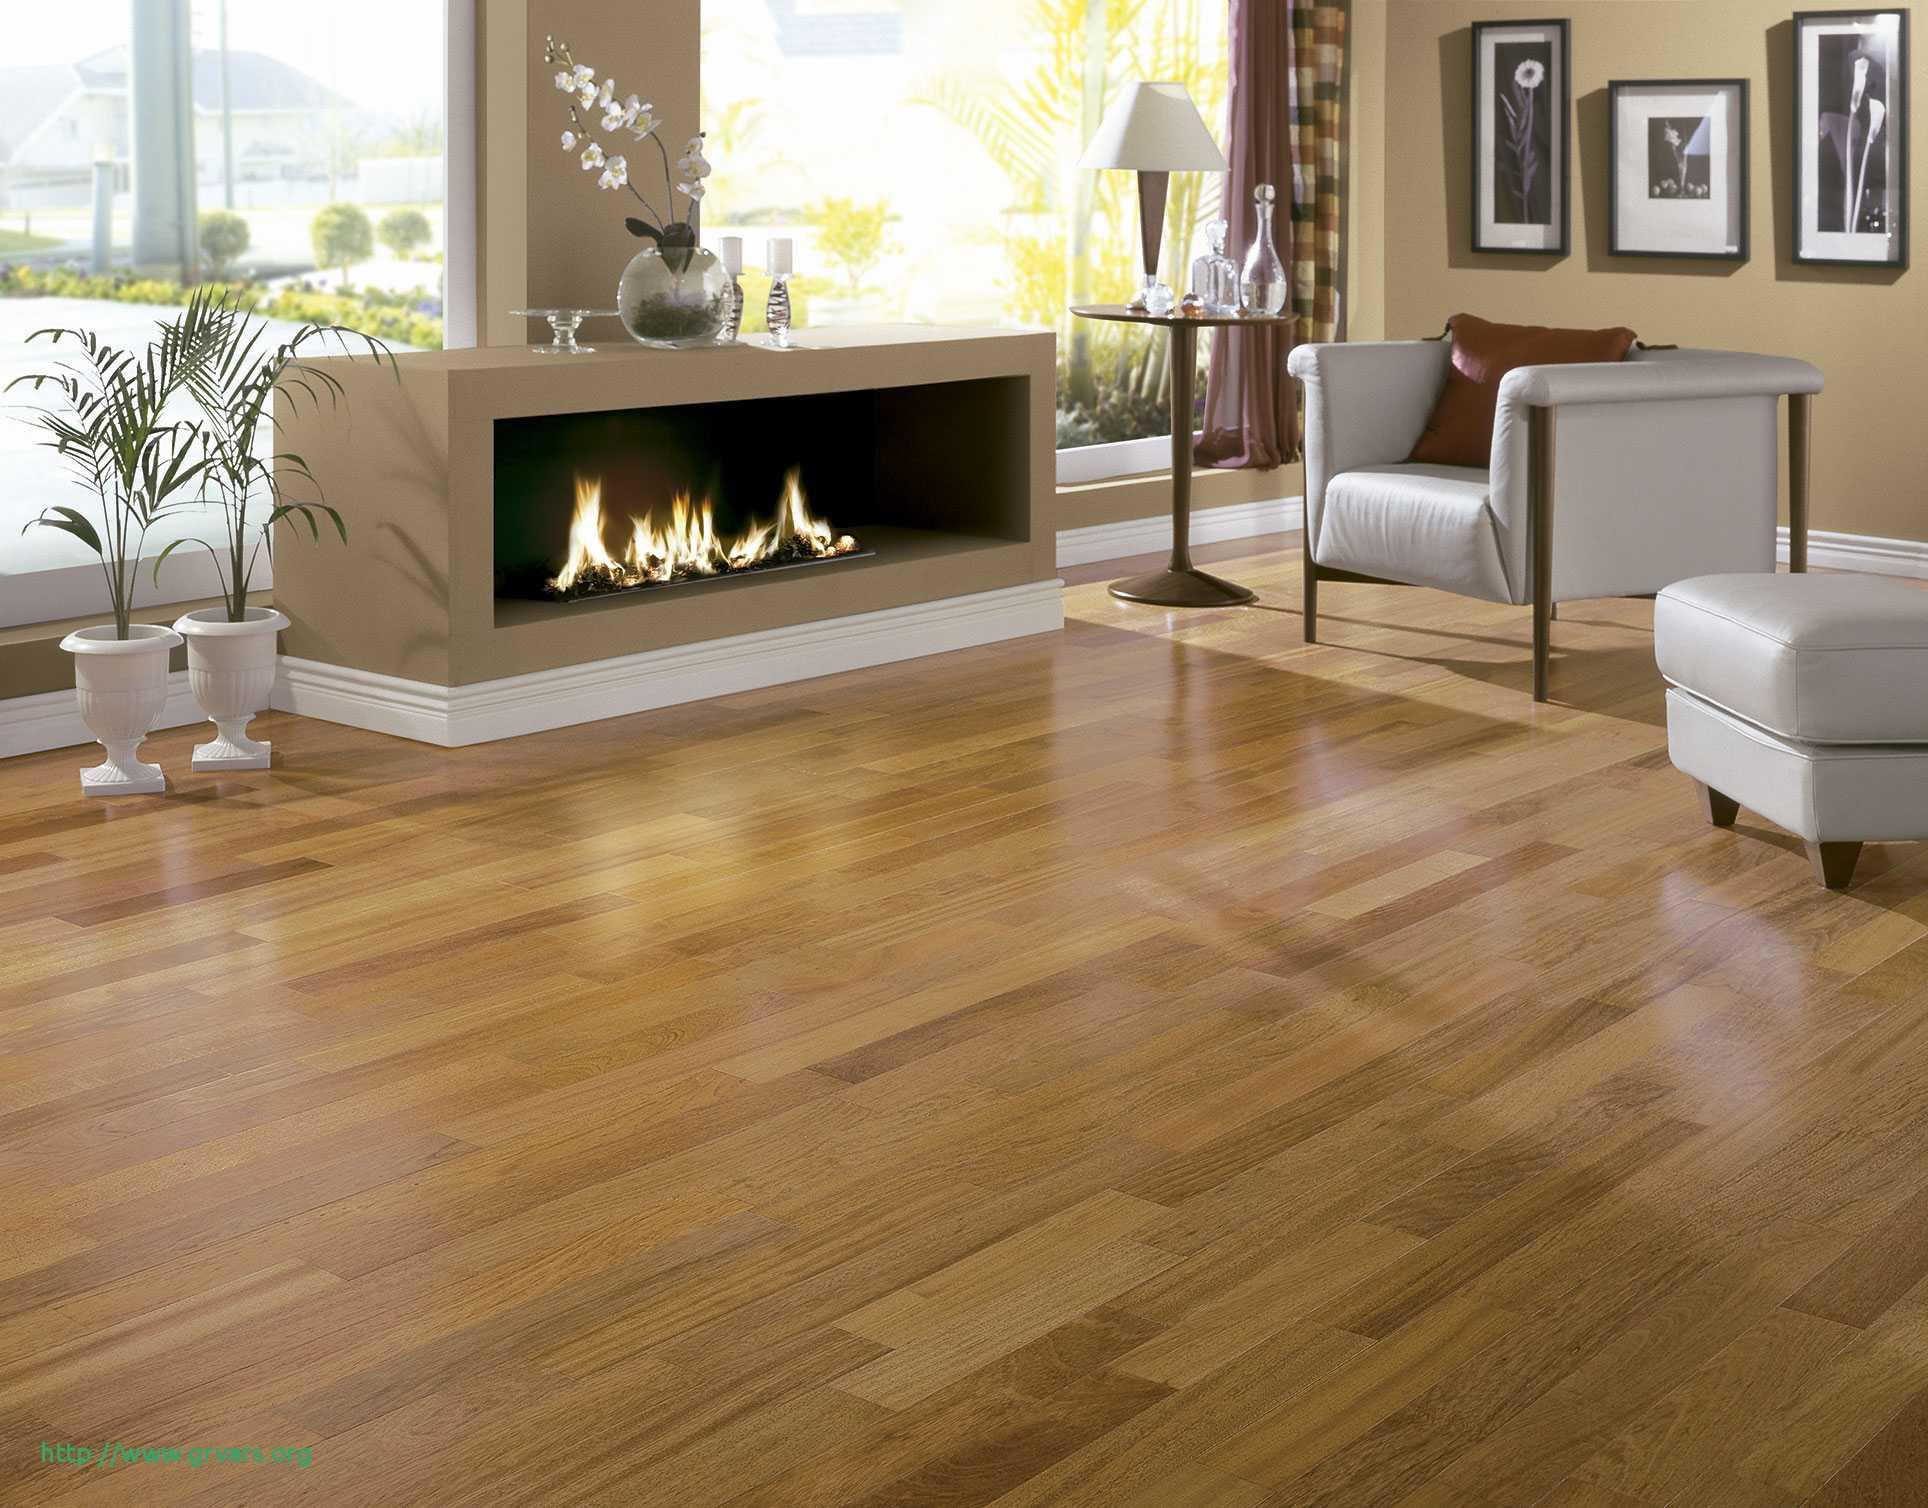 cheap hardwood flooring ottawa of 21 beau cheapest hardwood flooring in toronto ideas blog pertaining to cheapest hardwood flooring in toronto unique fabulous discount hardwood flooring 0 floor brampton 25 toronto